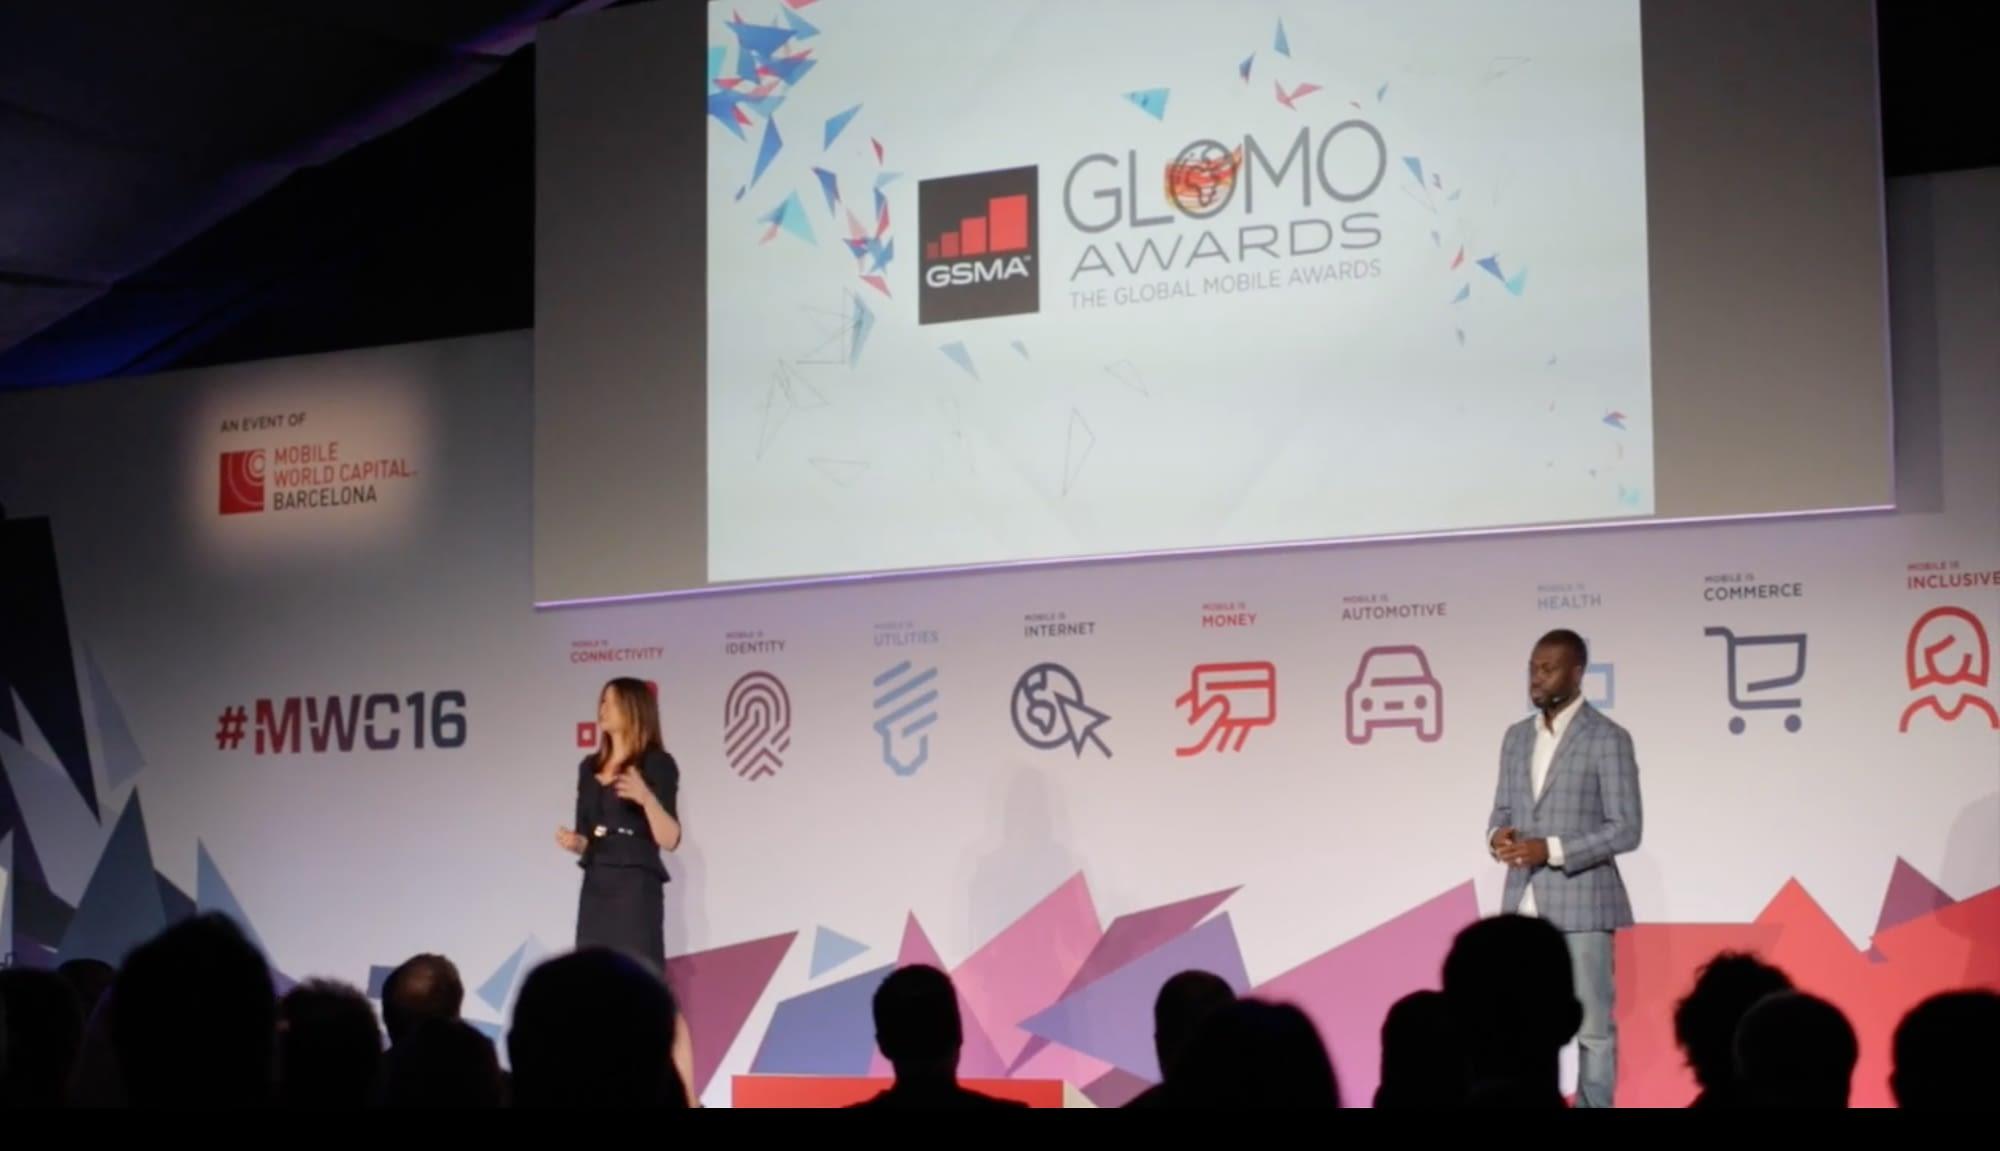 Audiovisual Services Mobile World Congress 2020